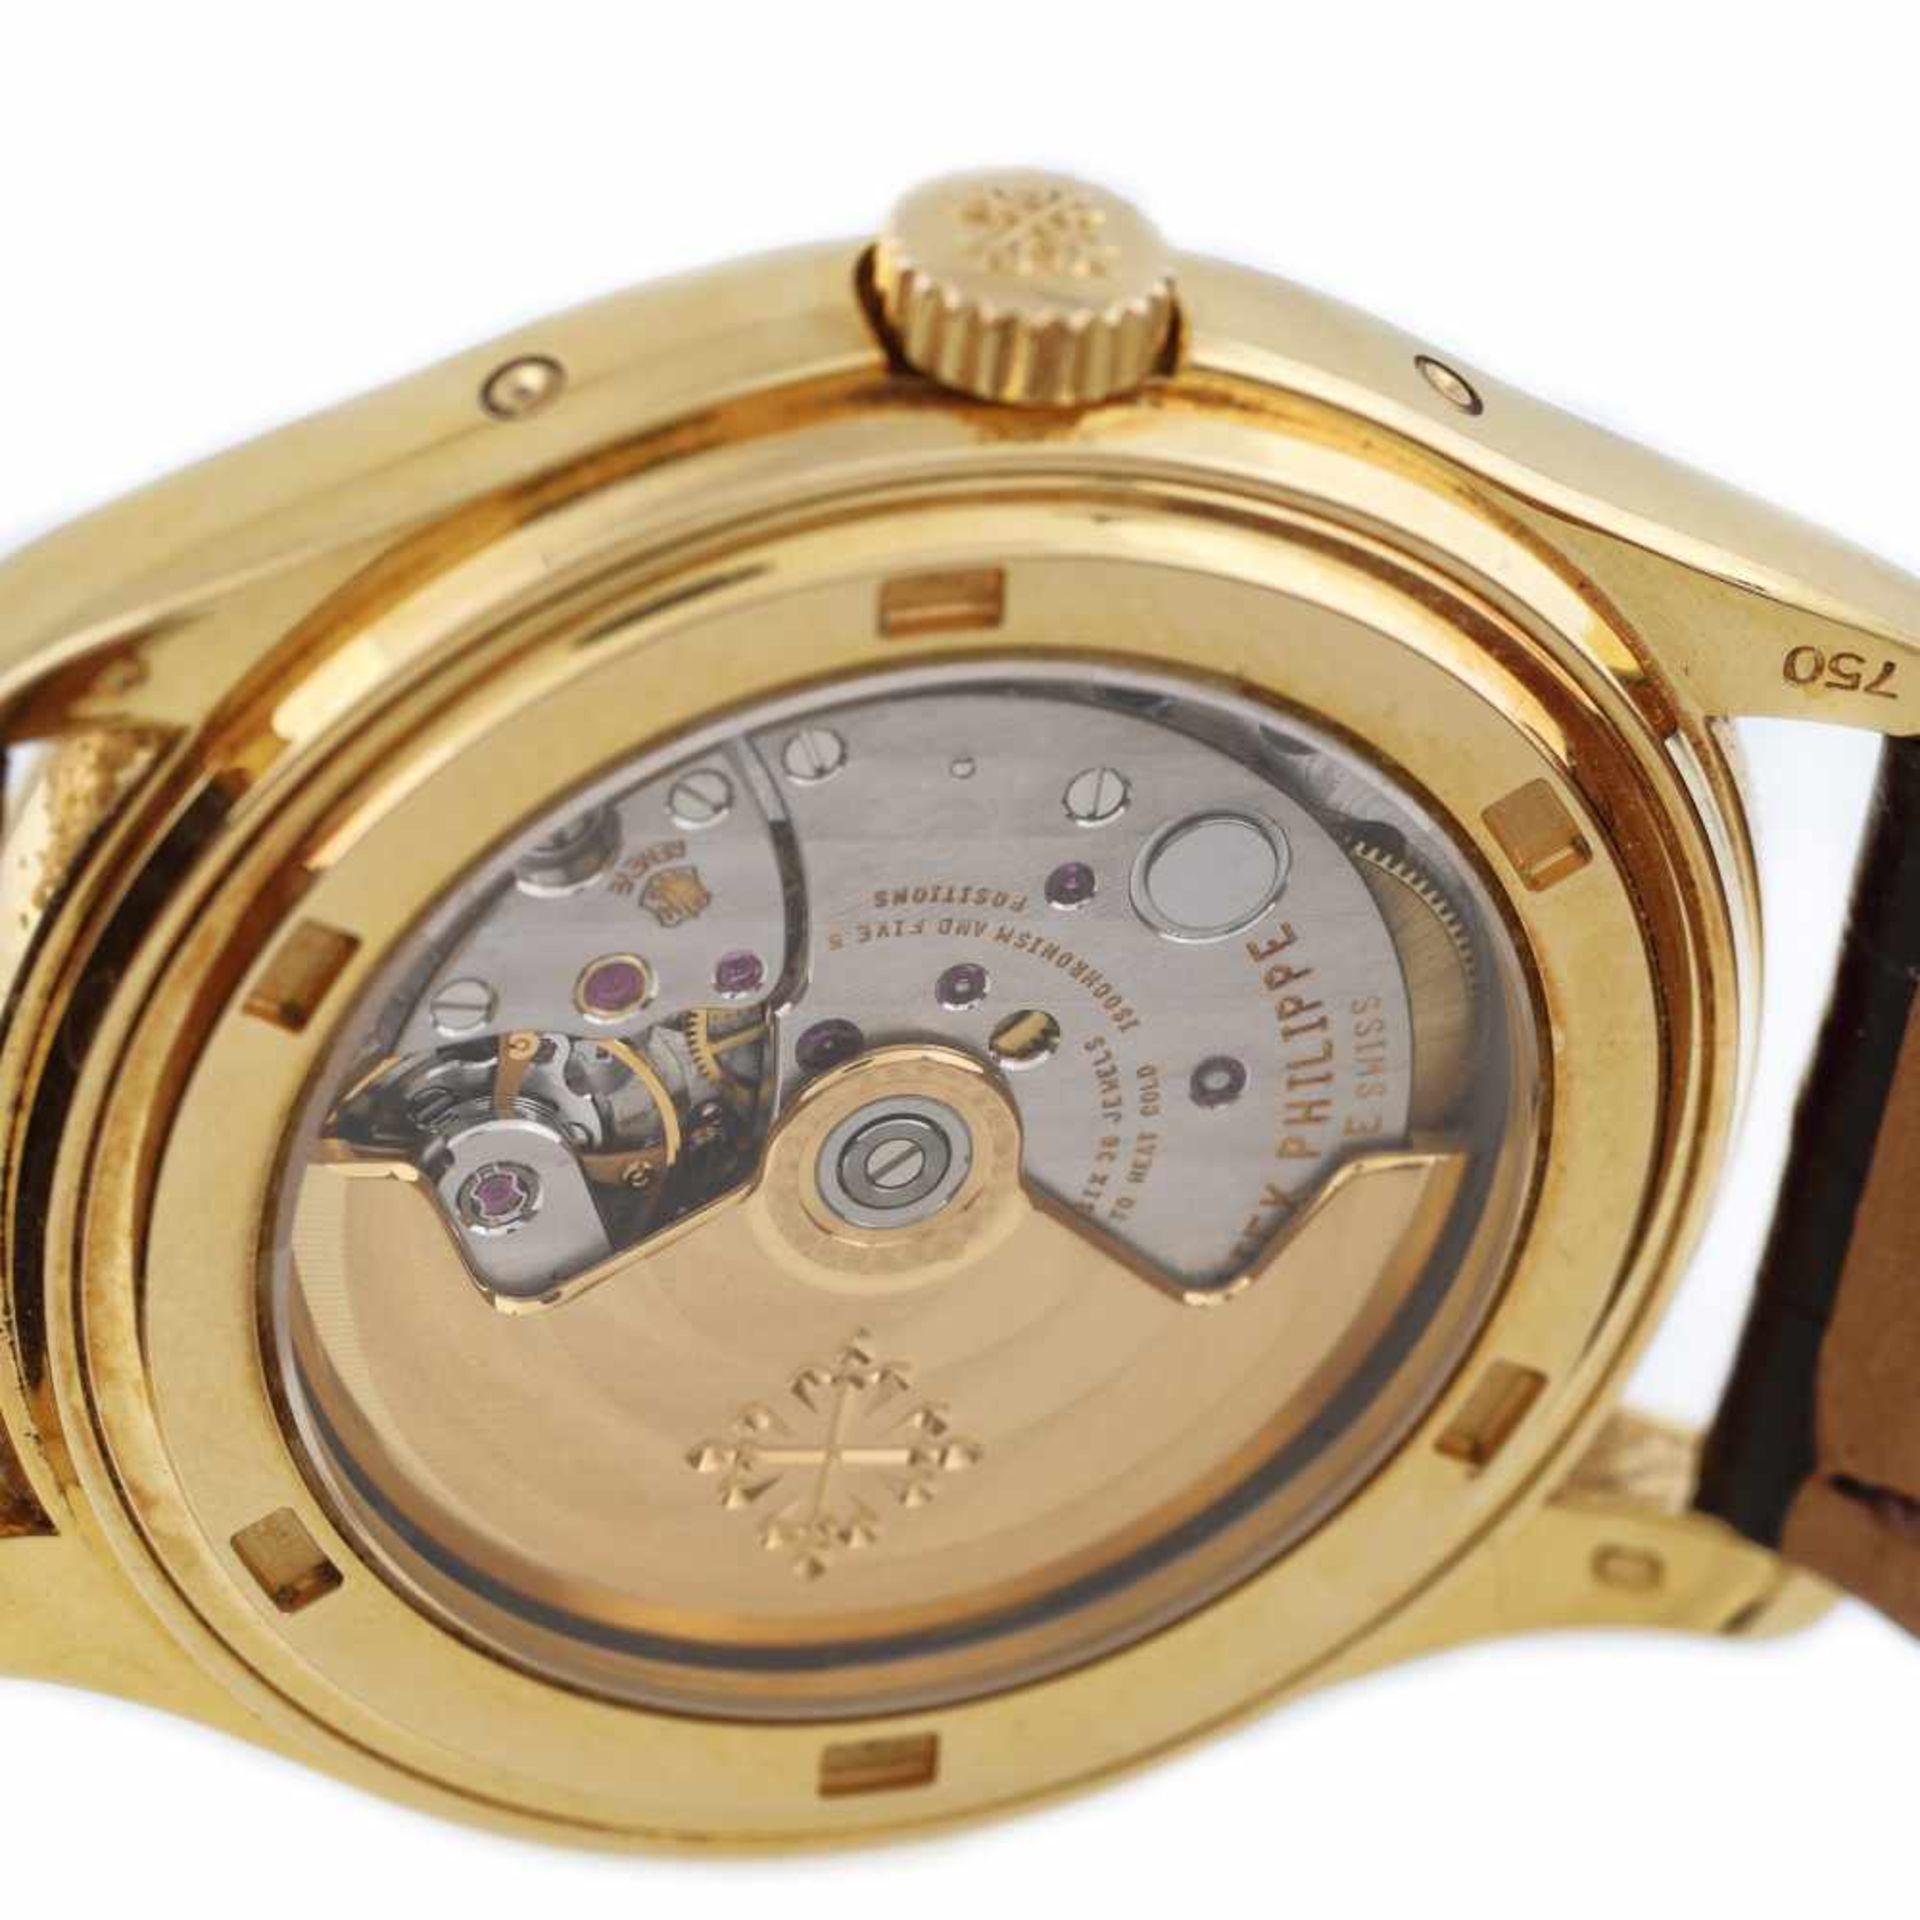 Patek Philippe Annual Calendar Moon Phase wristwatch, gold, men, provenance documents and original b - Bild 4 aus 4